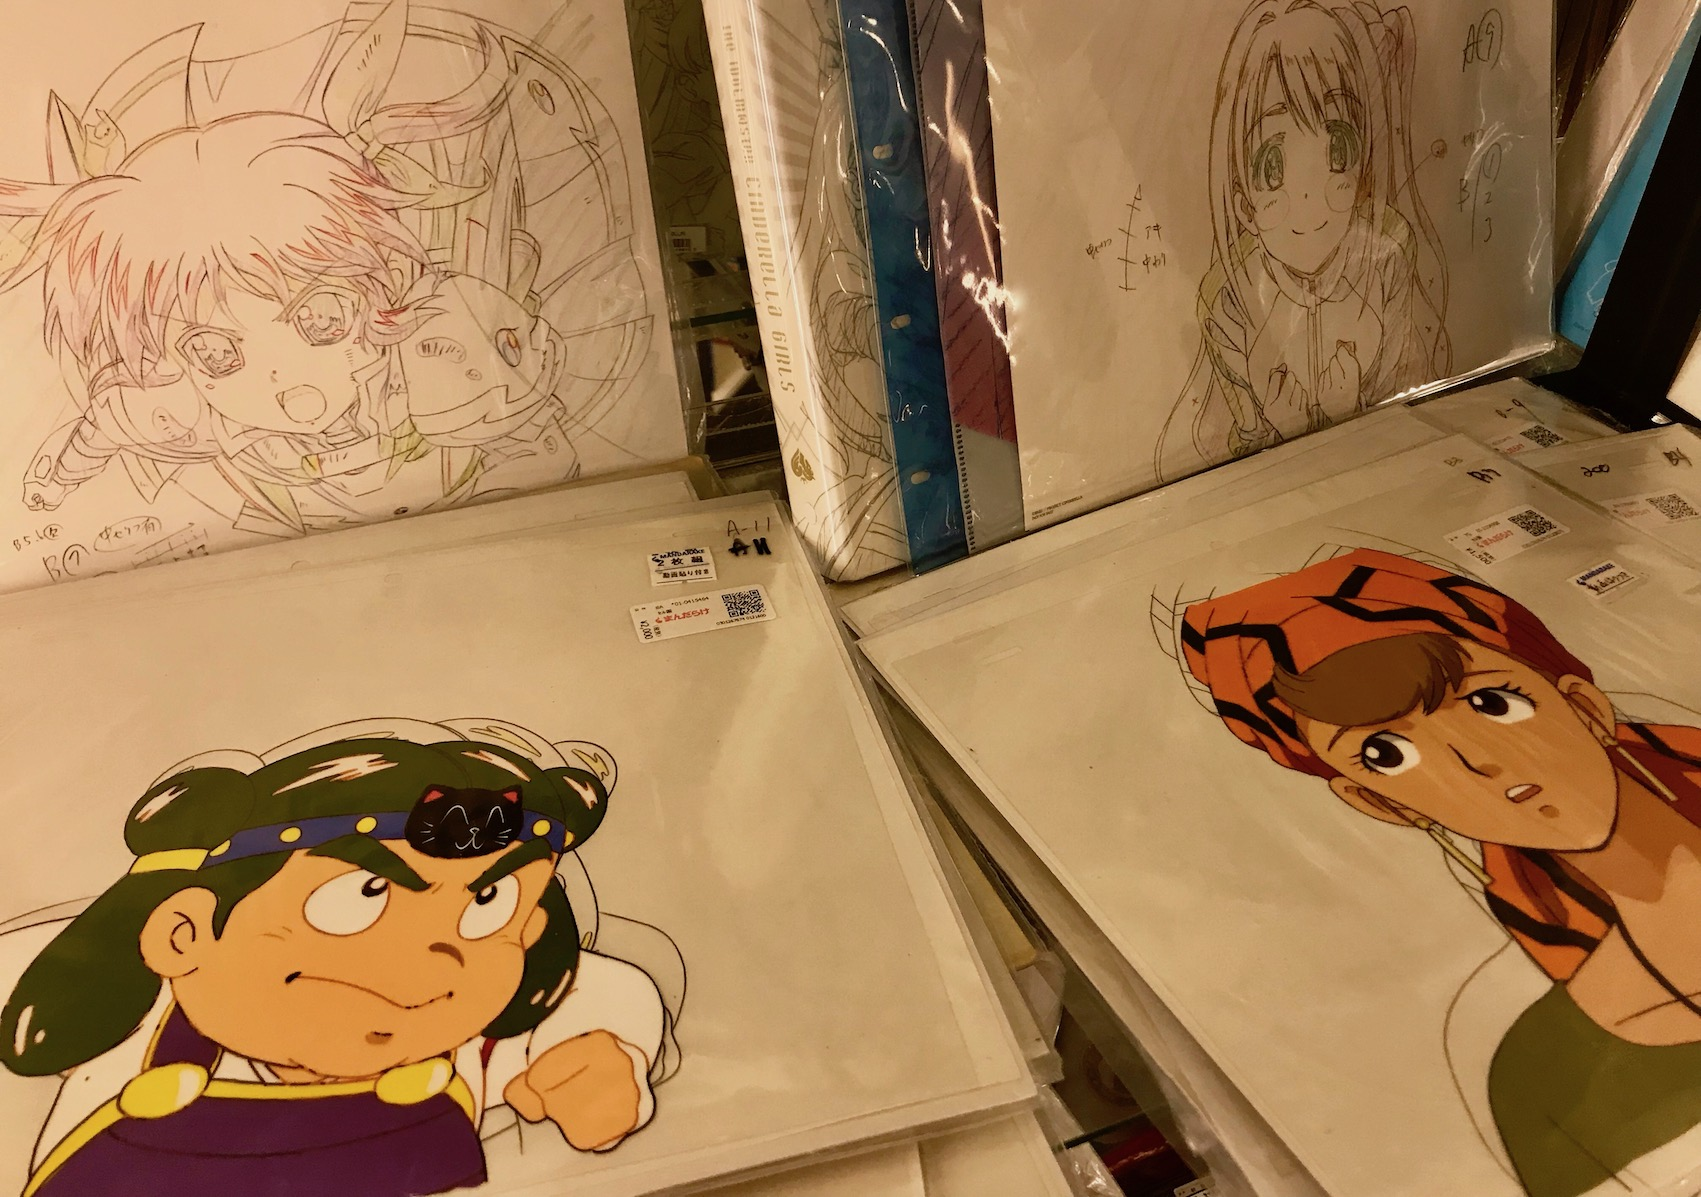 Manga sketch collectibles 1st floor Mandarake Complex Tokyo